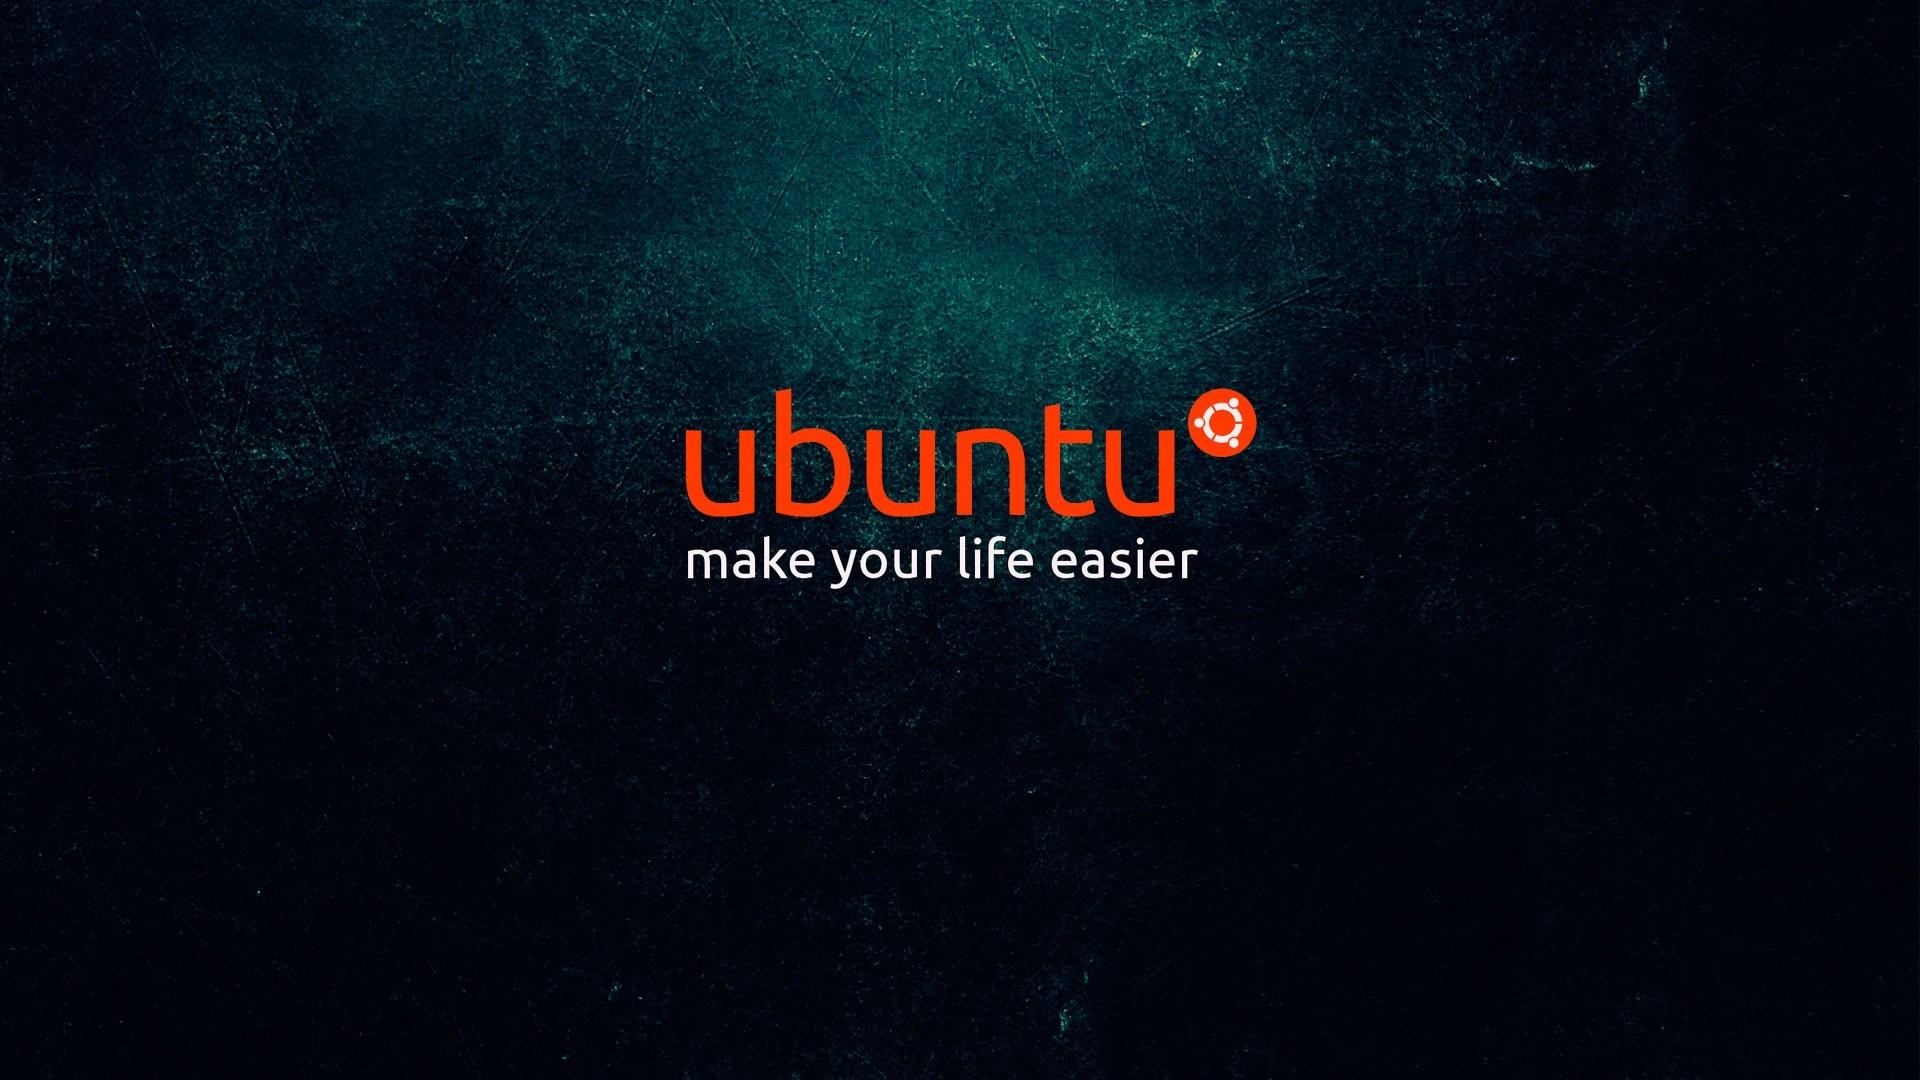 Ubuntu Linux fondos de pantalla Ubuntu Linux fotos